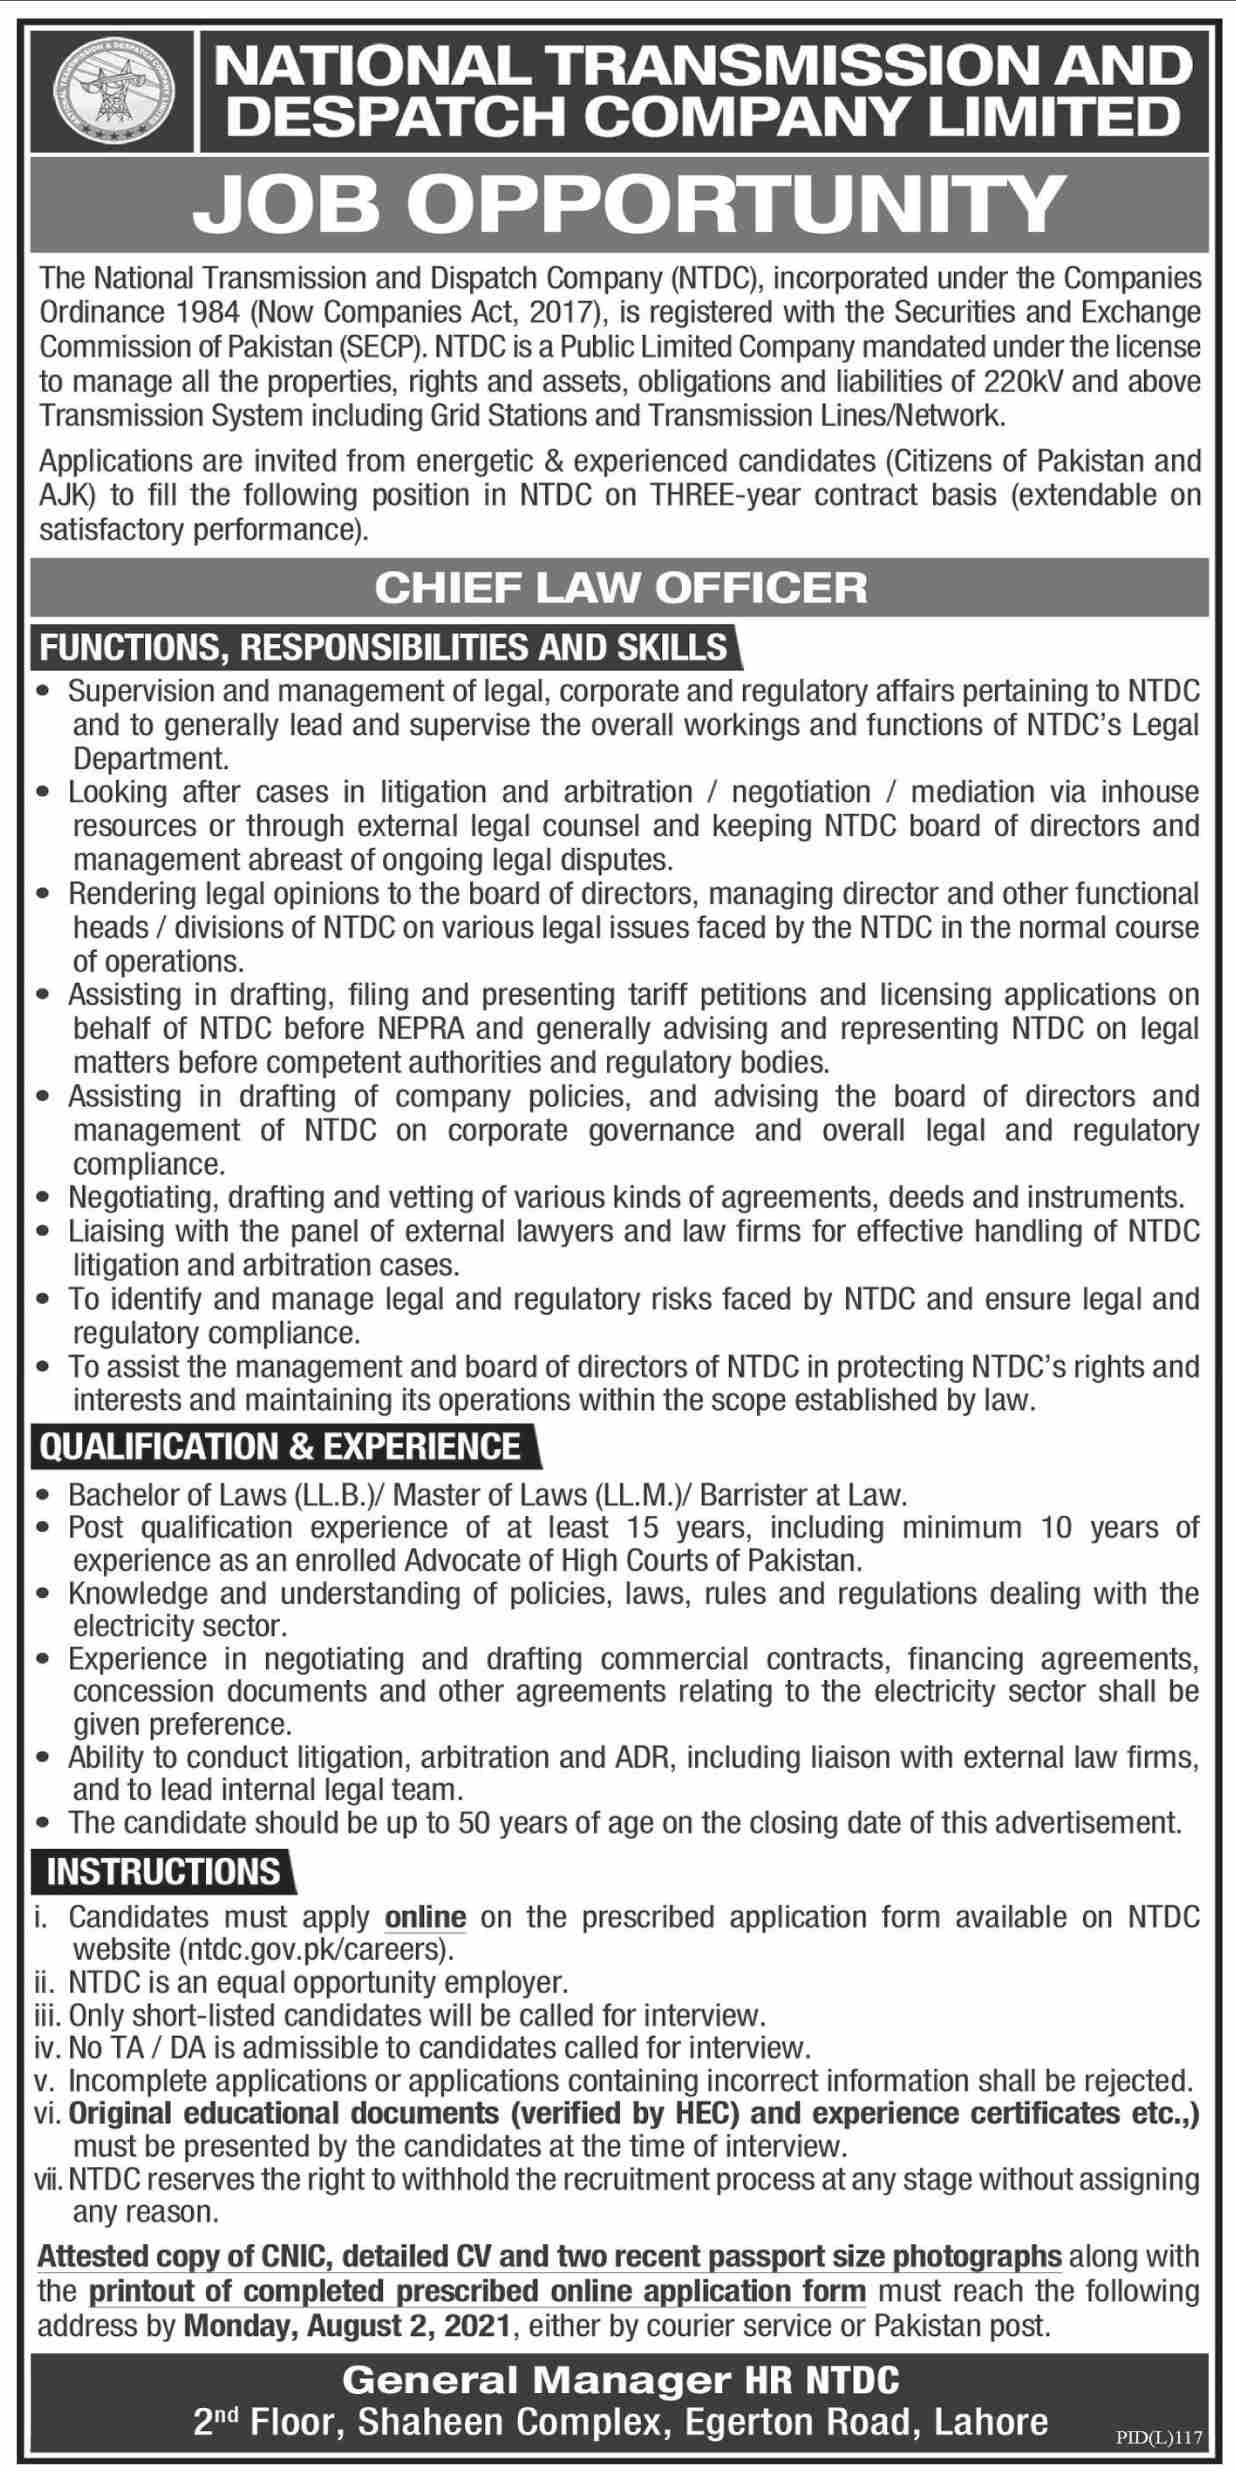 National Transmission and Despatch Company Ltd Job 2021